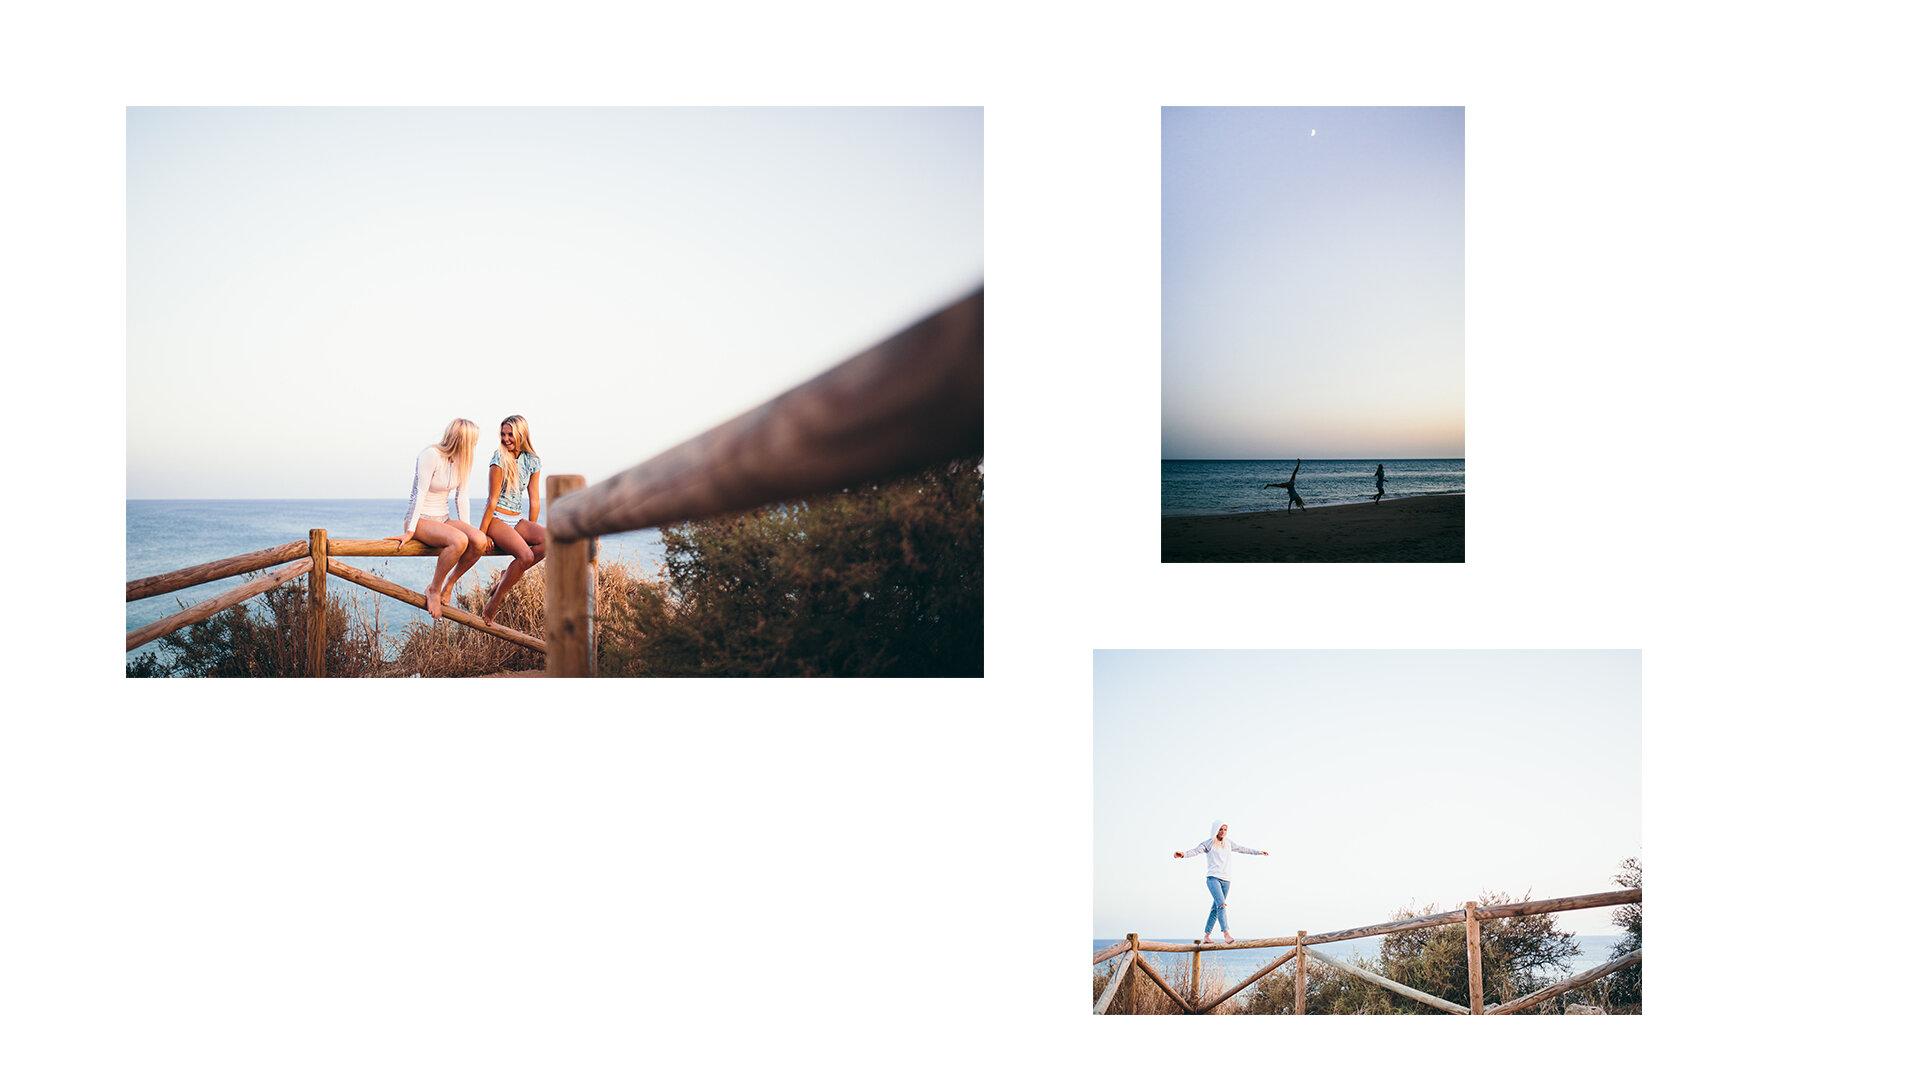 toby-butler-tobybutlerphoto-surf-surfing-waterphotography-ocean-Oneill-wetsuits-swimwear-girl-bikini-clothing-surf-portugal-lifestylephotography-5.jpg